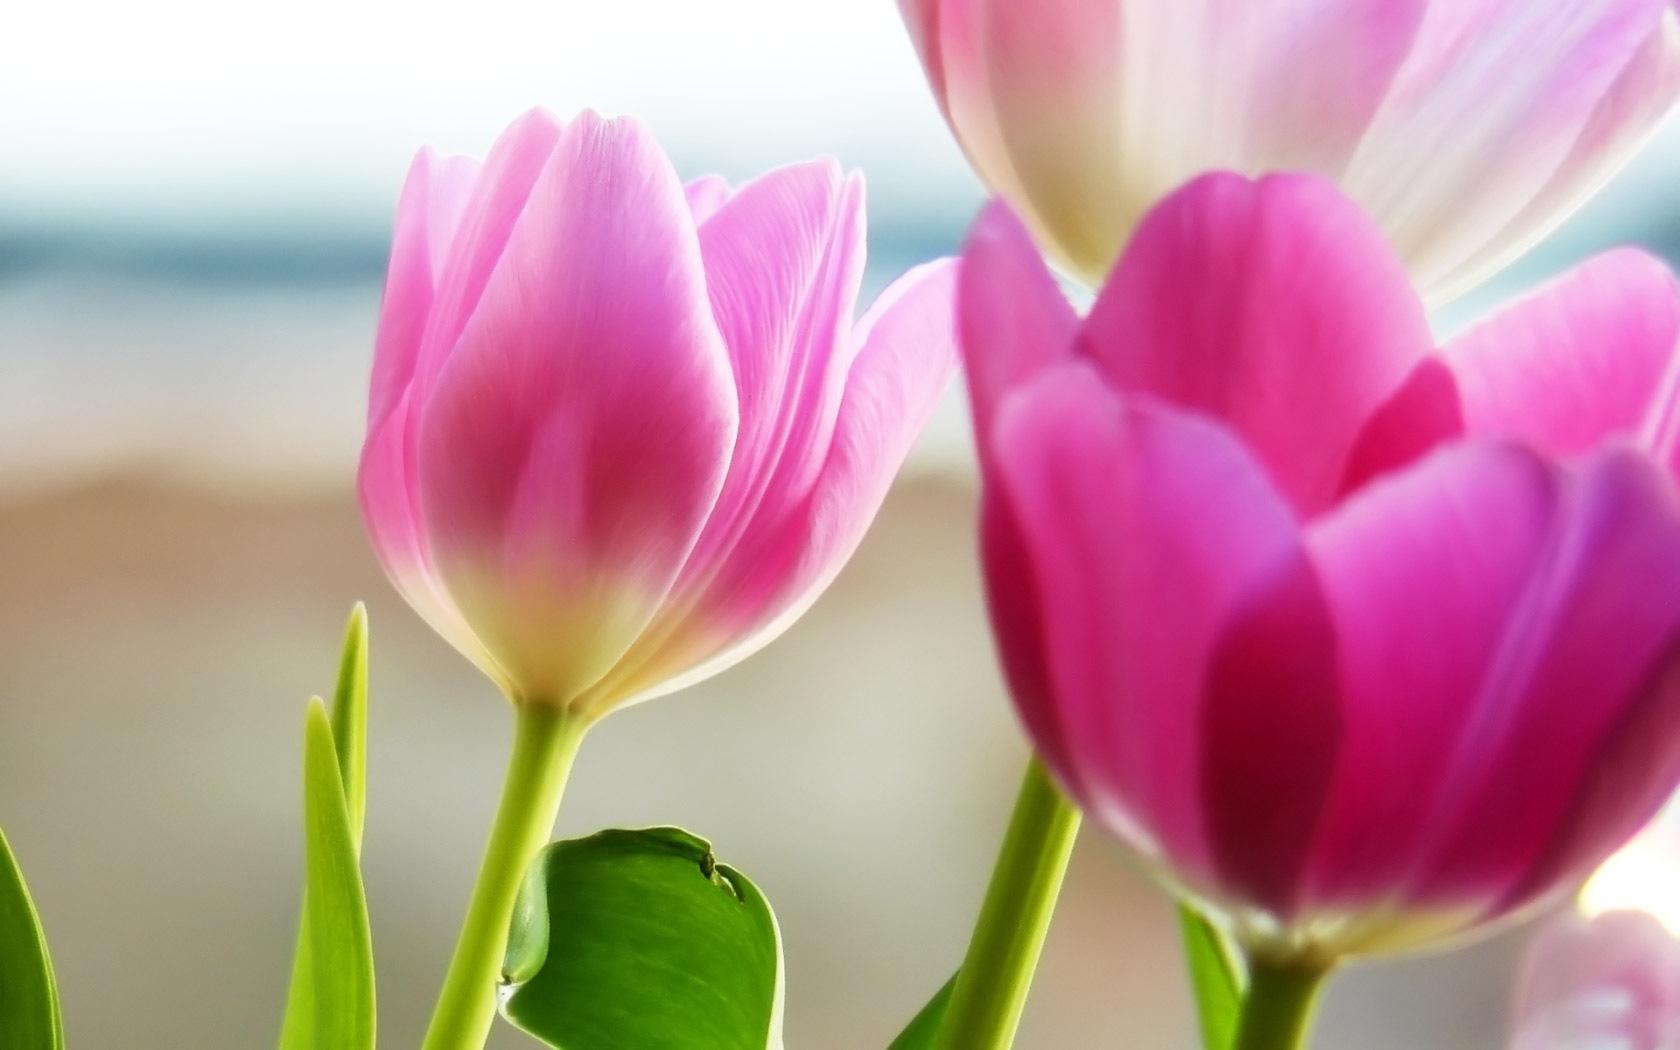 Tulip Images Free - HD Desktop Wallpapers